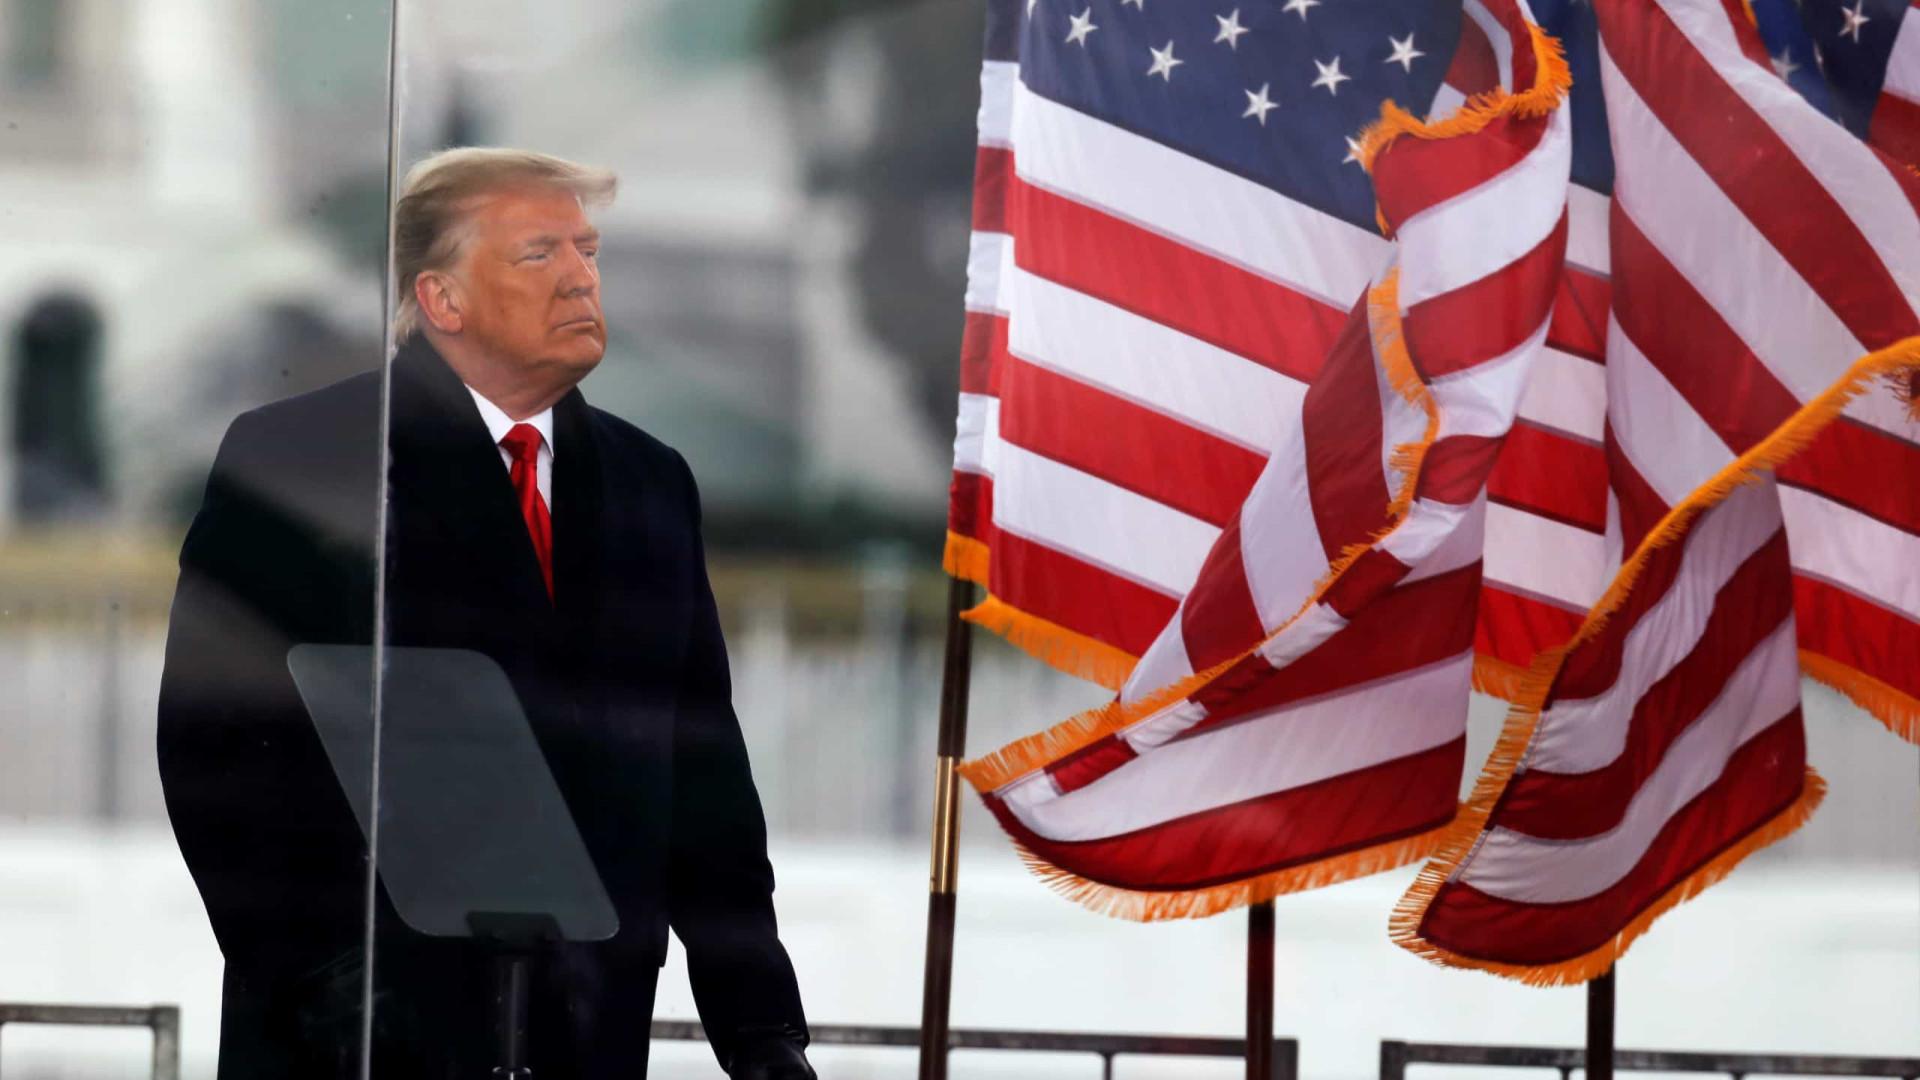 Trump prepara-se para conceder 100 indultos no último dia do seu mandato